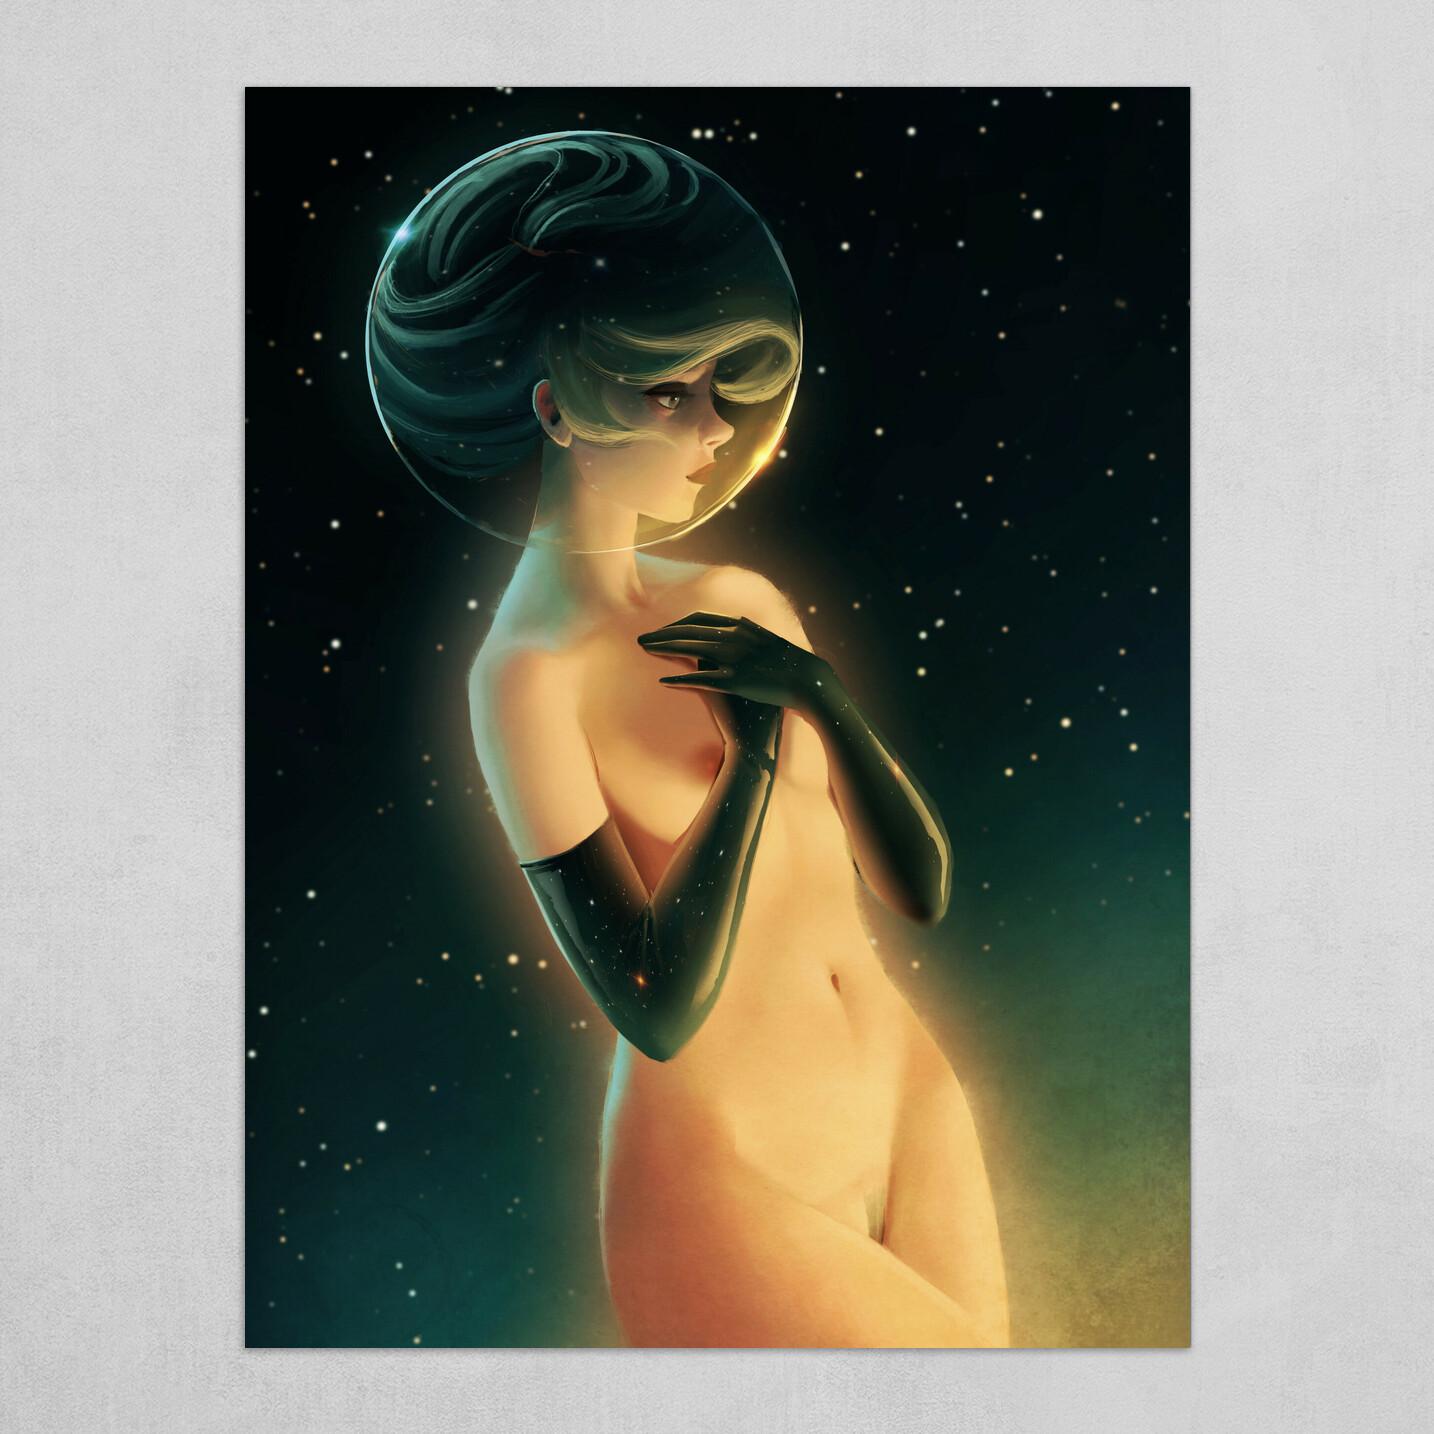 Wandering Star